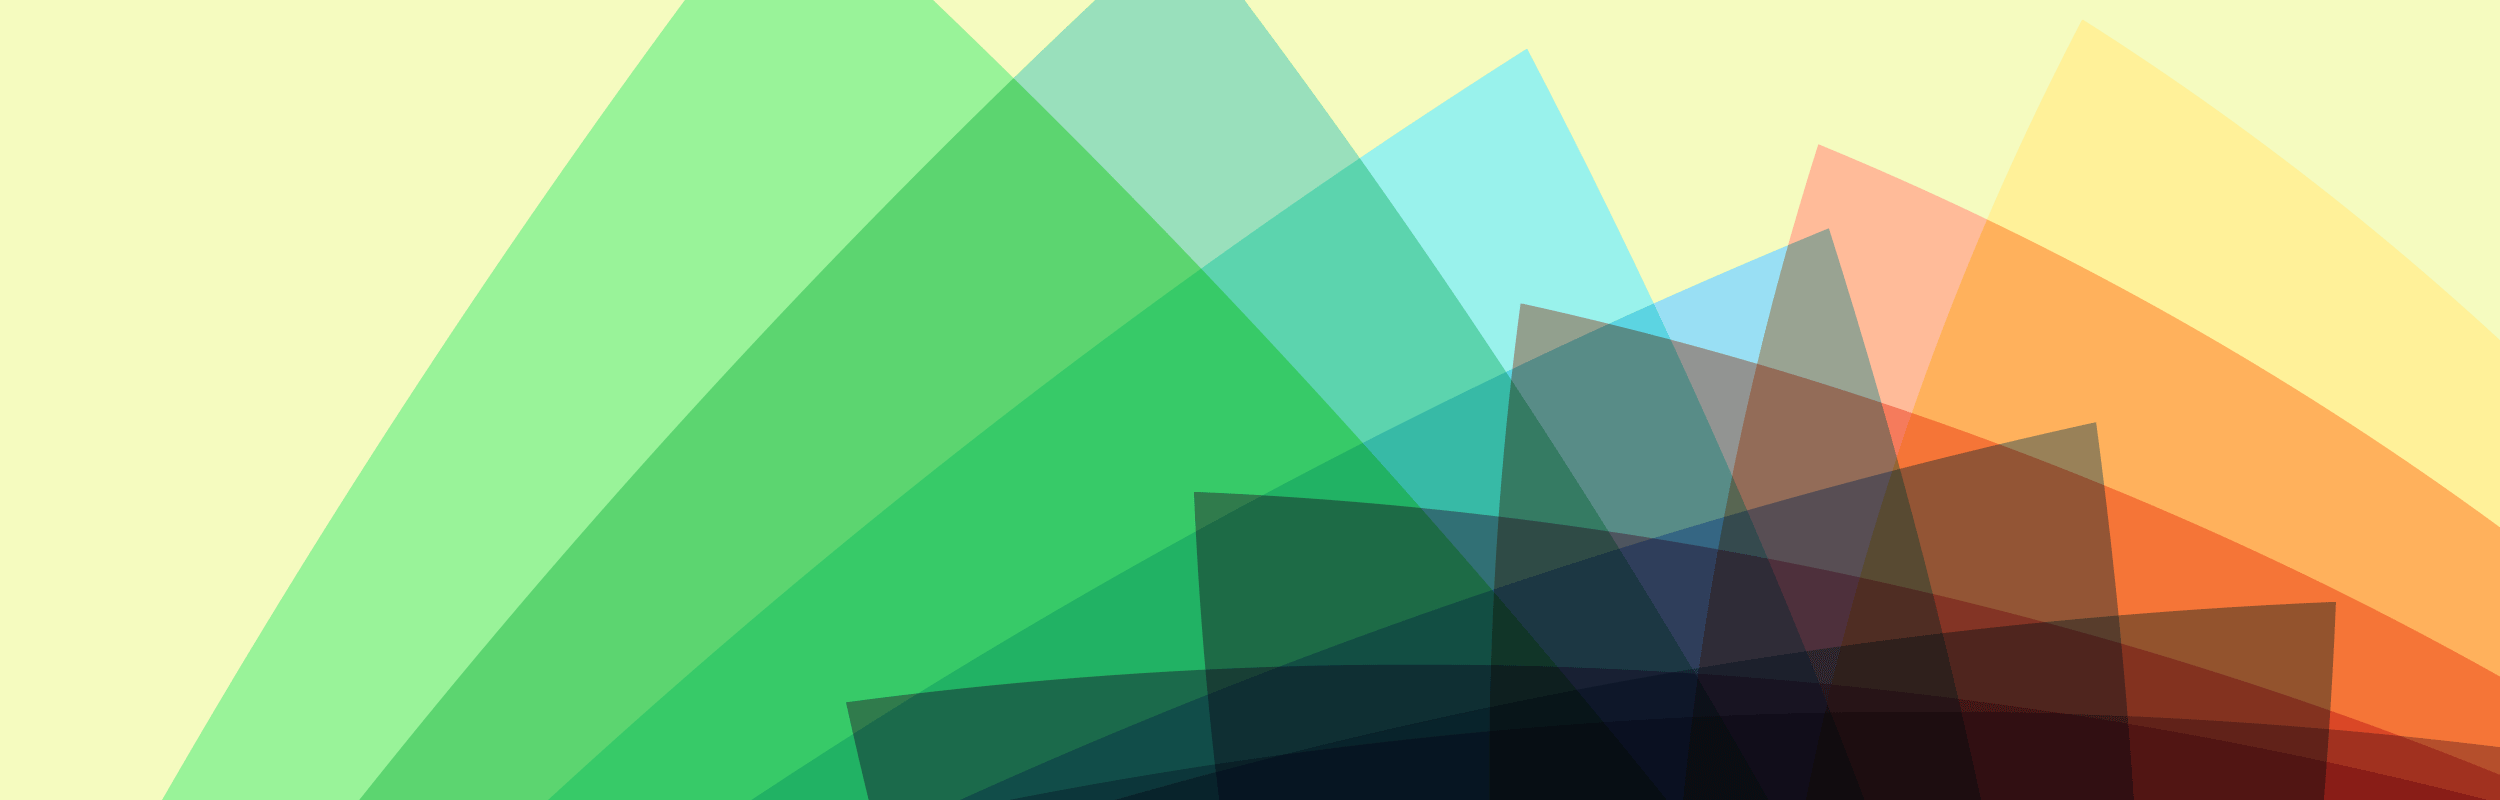 Create a Full Spectrum Spirograph in Adobe Illustrator